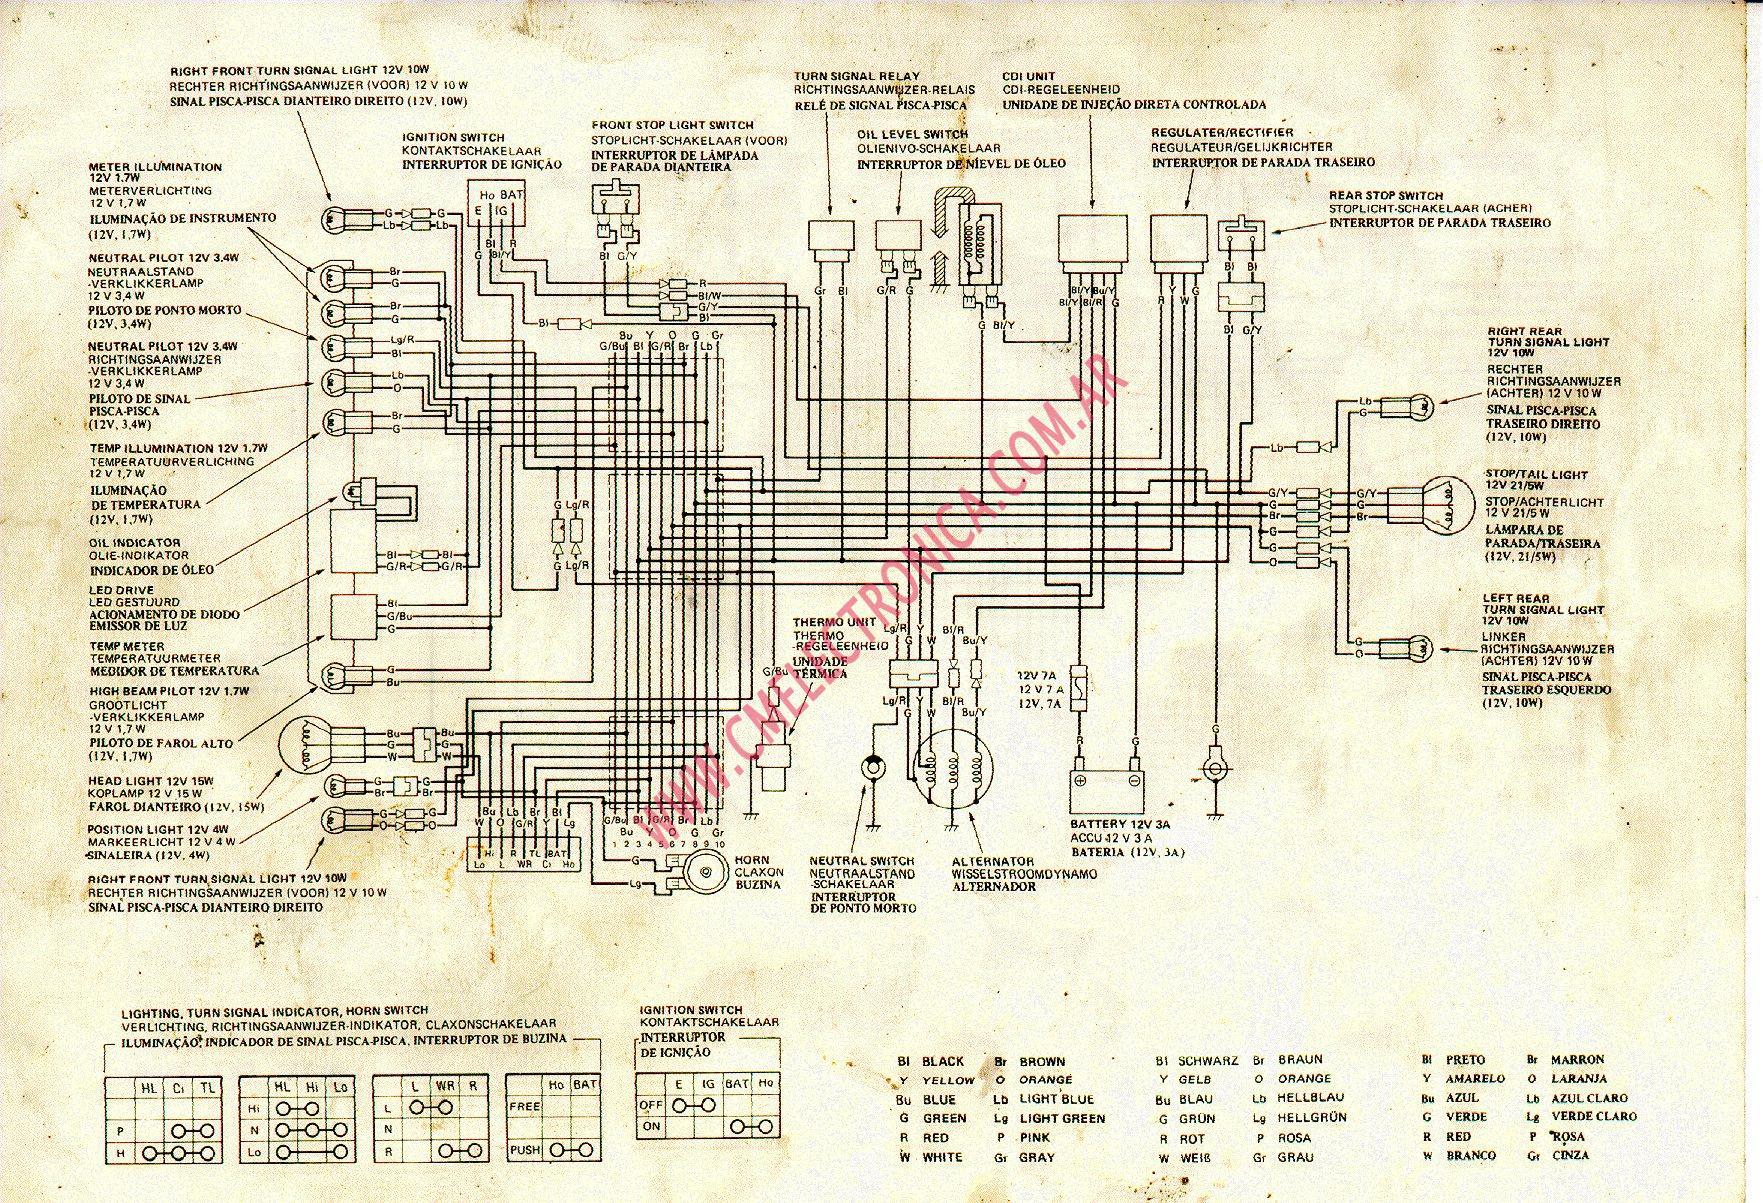 Volvo Truck Radio Wiring Harness Auto Electrical Diagram 2000 Stereo Honda Civic 2012